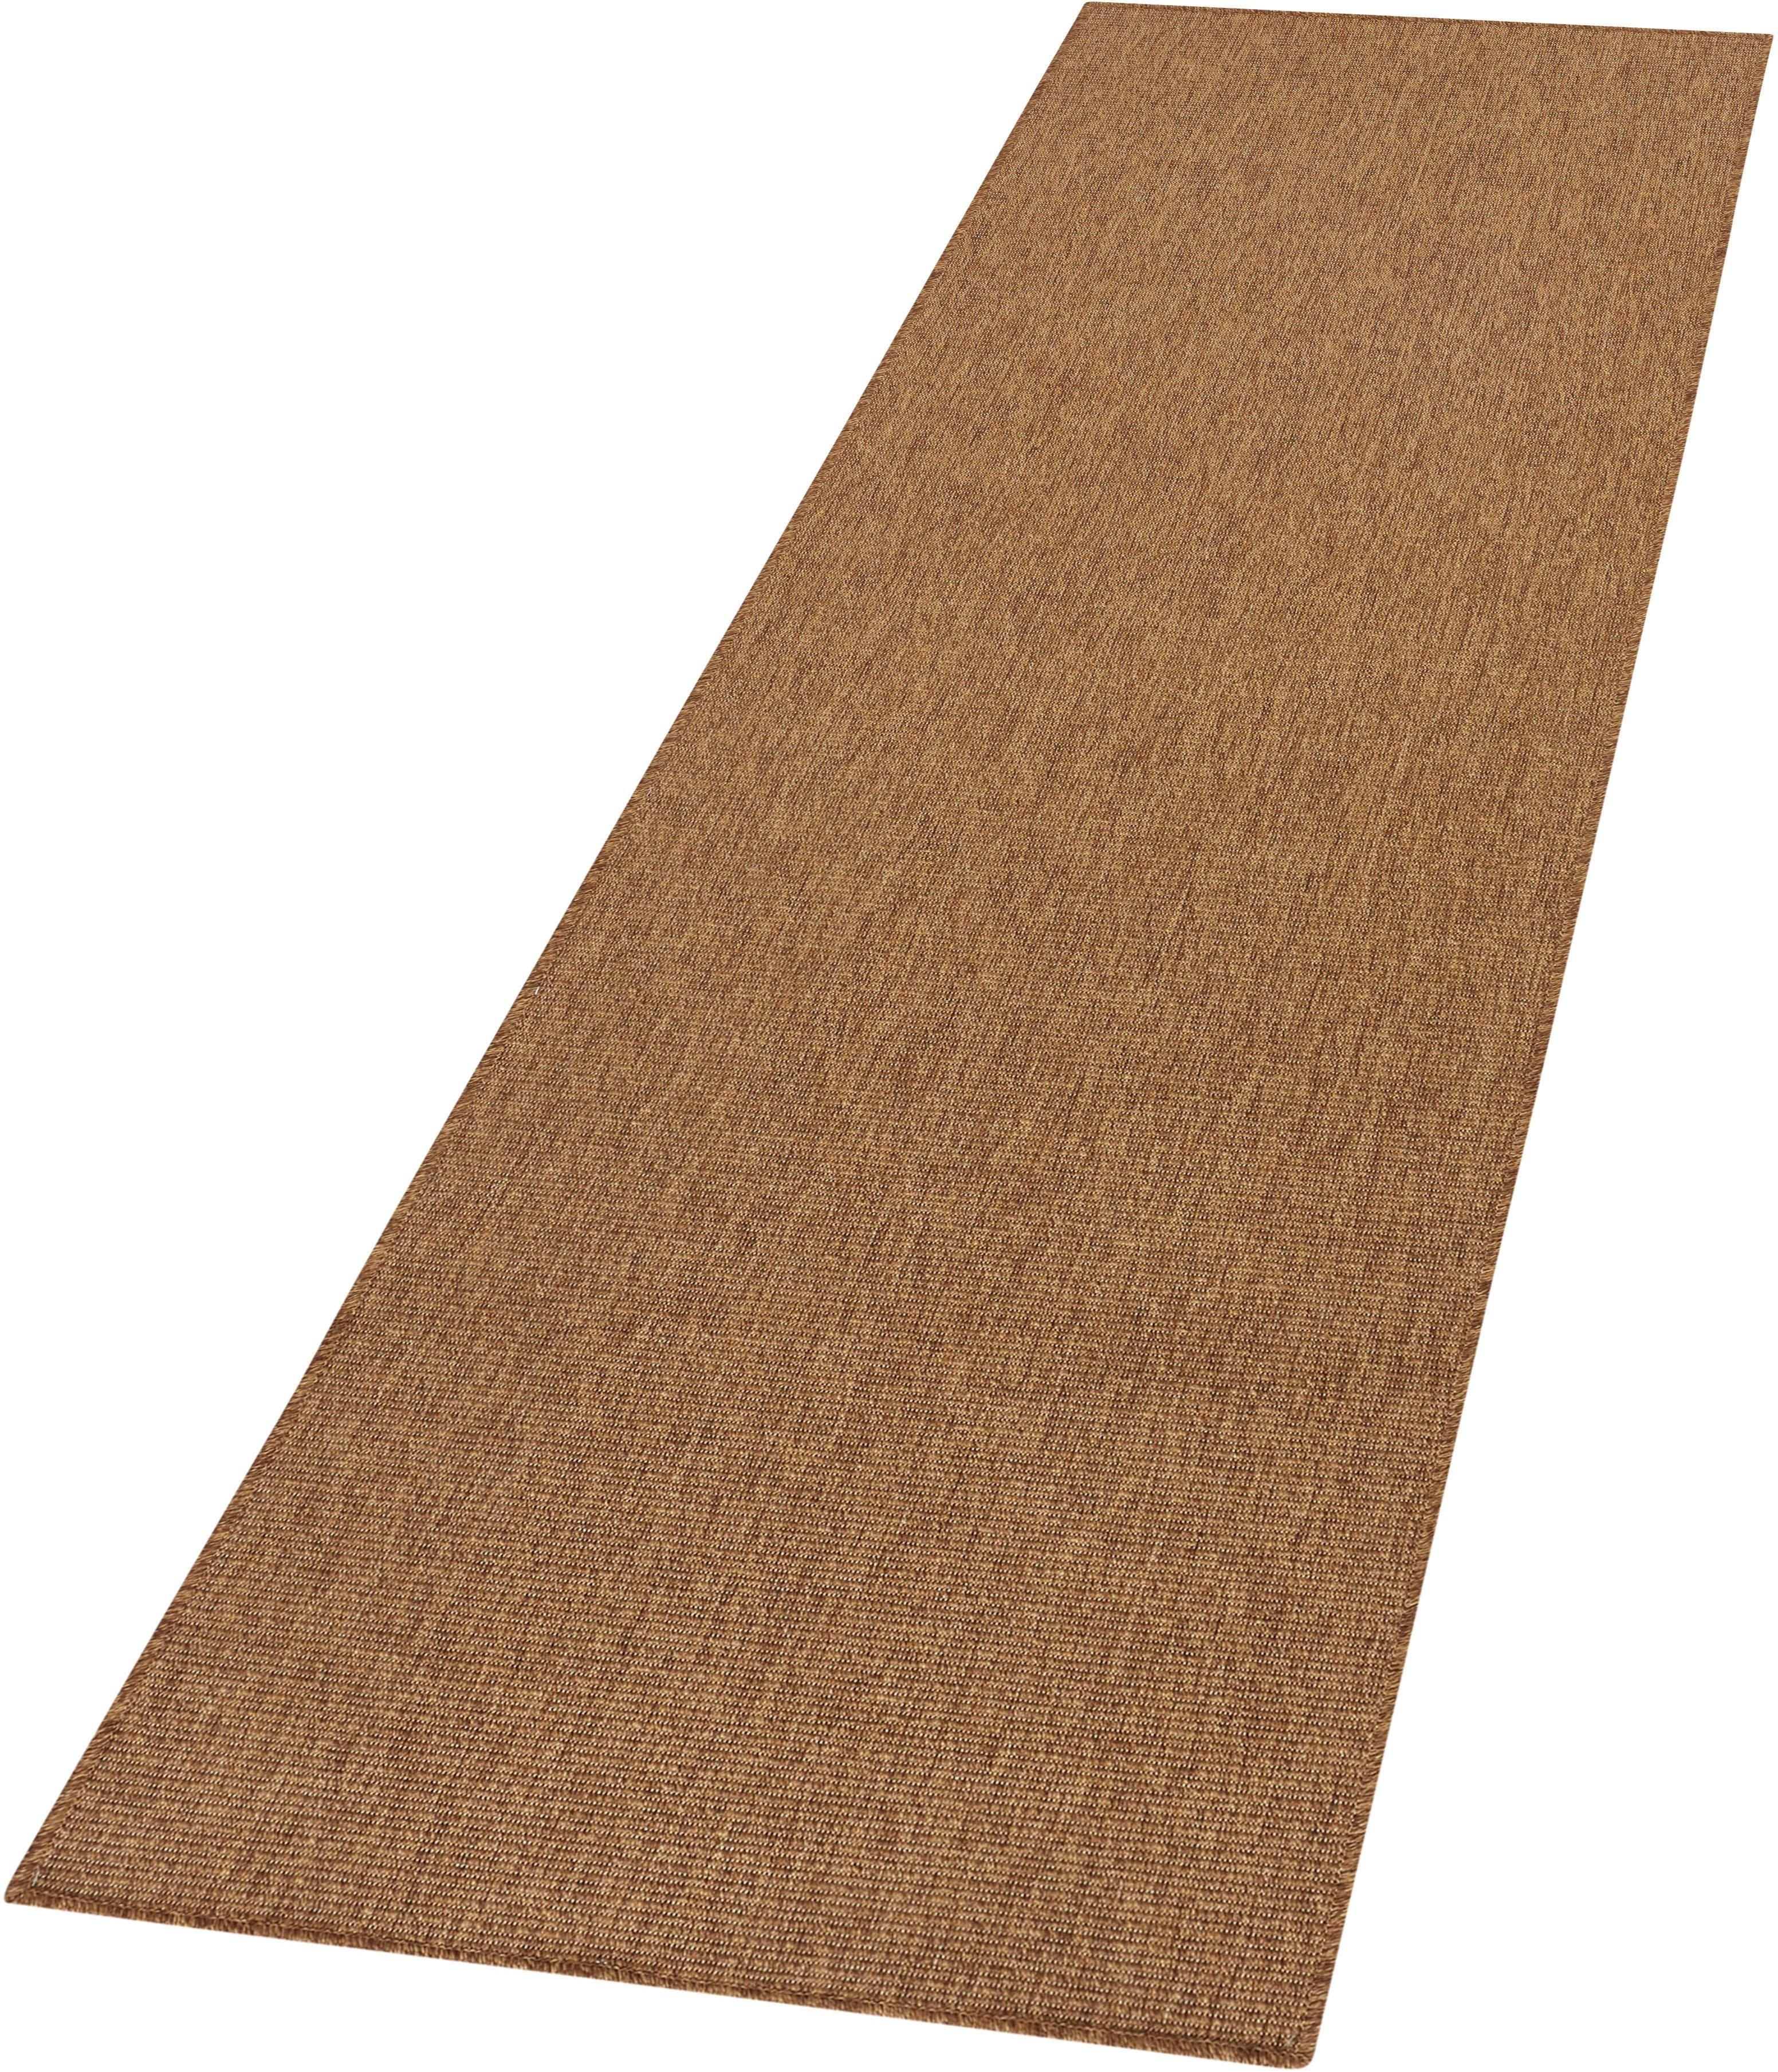 Bt Carpet Loper, »Nature«, rechthoekig, hoogte 5 mm, machinaal geweven - verschillende betaalmethodes